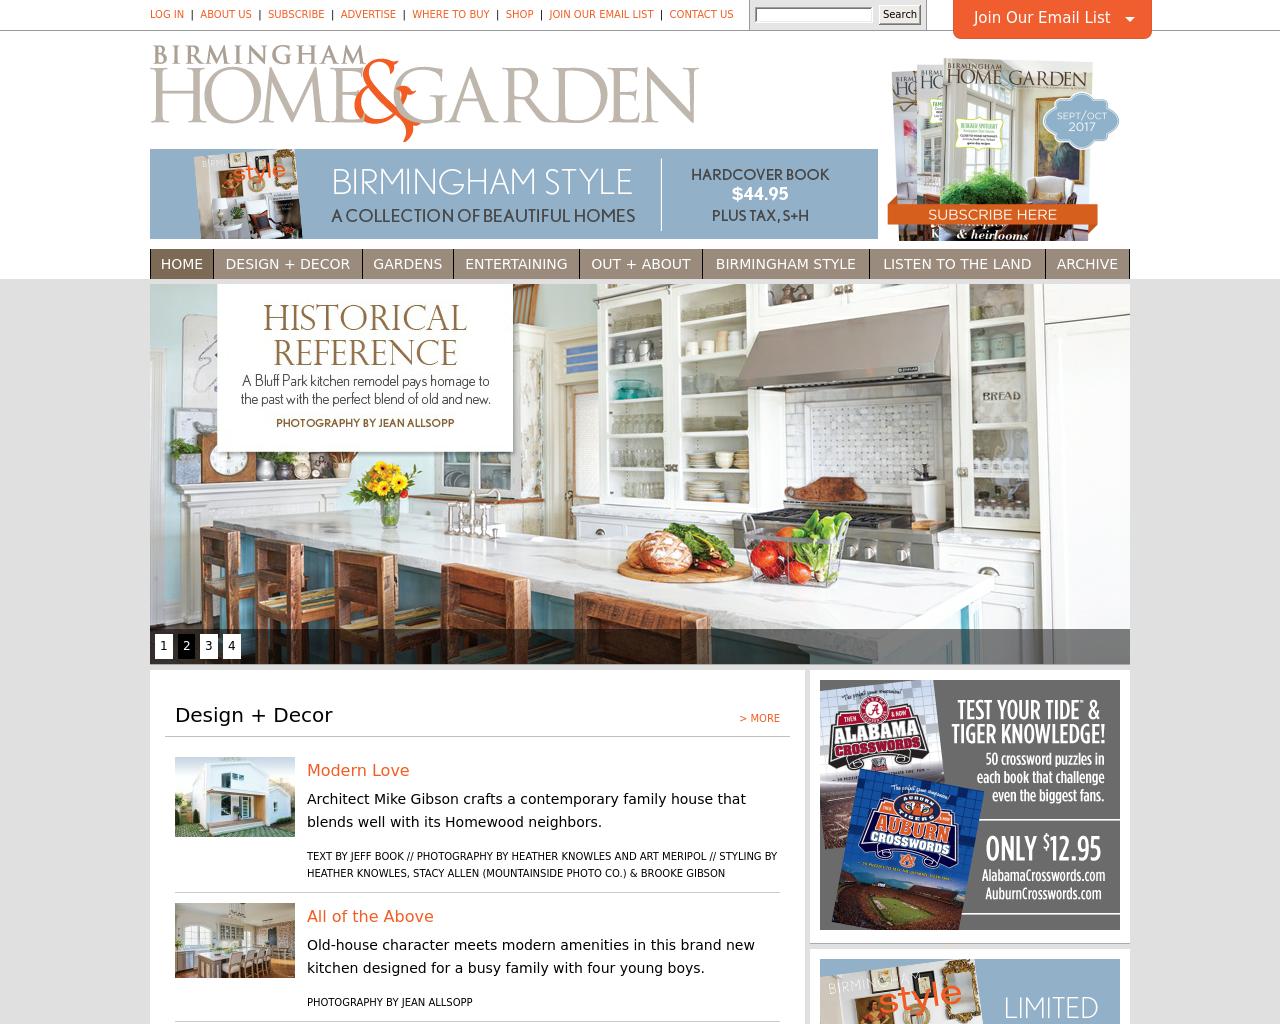 Birmingham-Home-&-Garden-Advertising-Reviews-Pricing